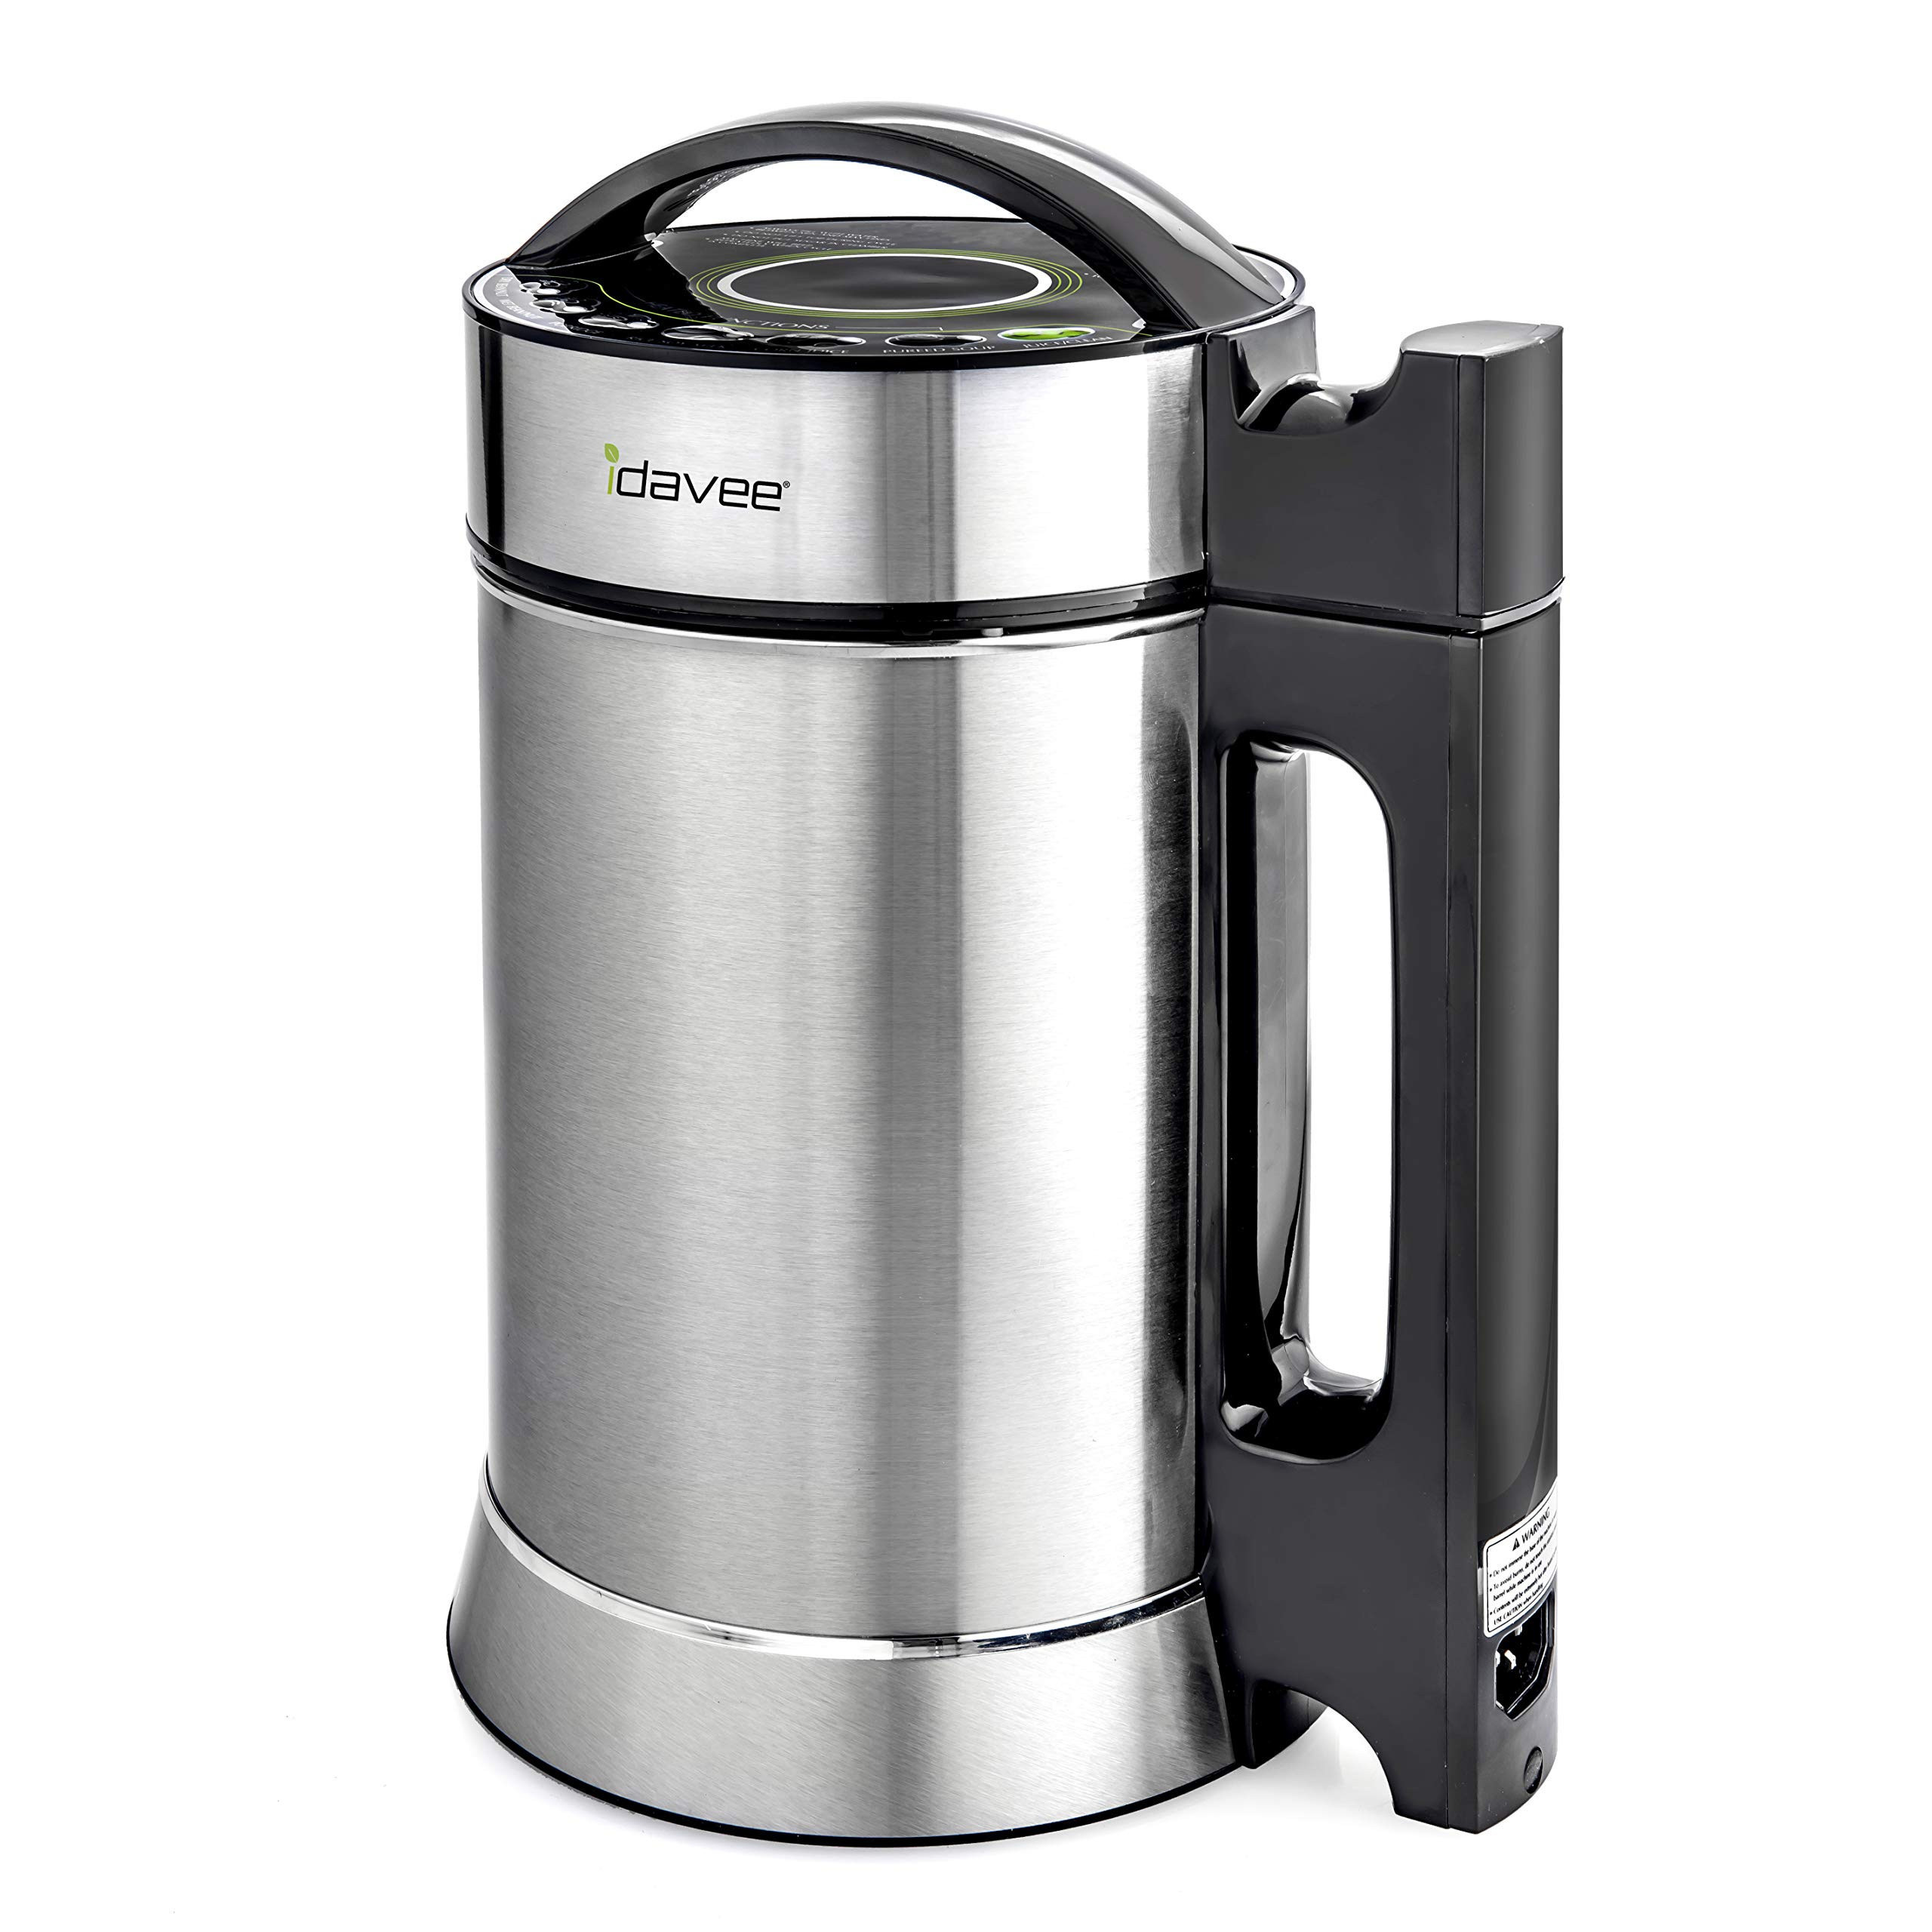 Idavee Brand - PrestoPure IAE15-1.9 Liter Automatic Hot Soy Milk (Almond, Rice, Quinoa Milk) Soup, Porridge & Cold Juice Maker - 2 Layer Stainless Steel - Recipe Booklet